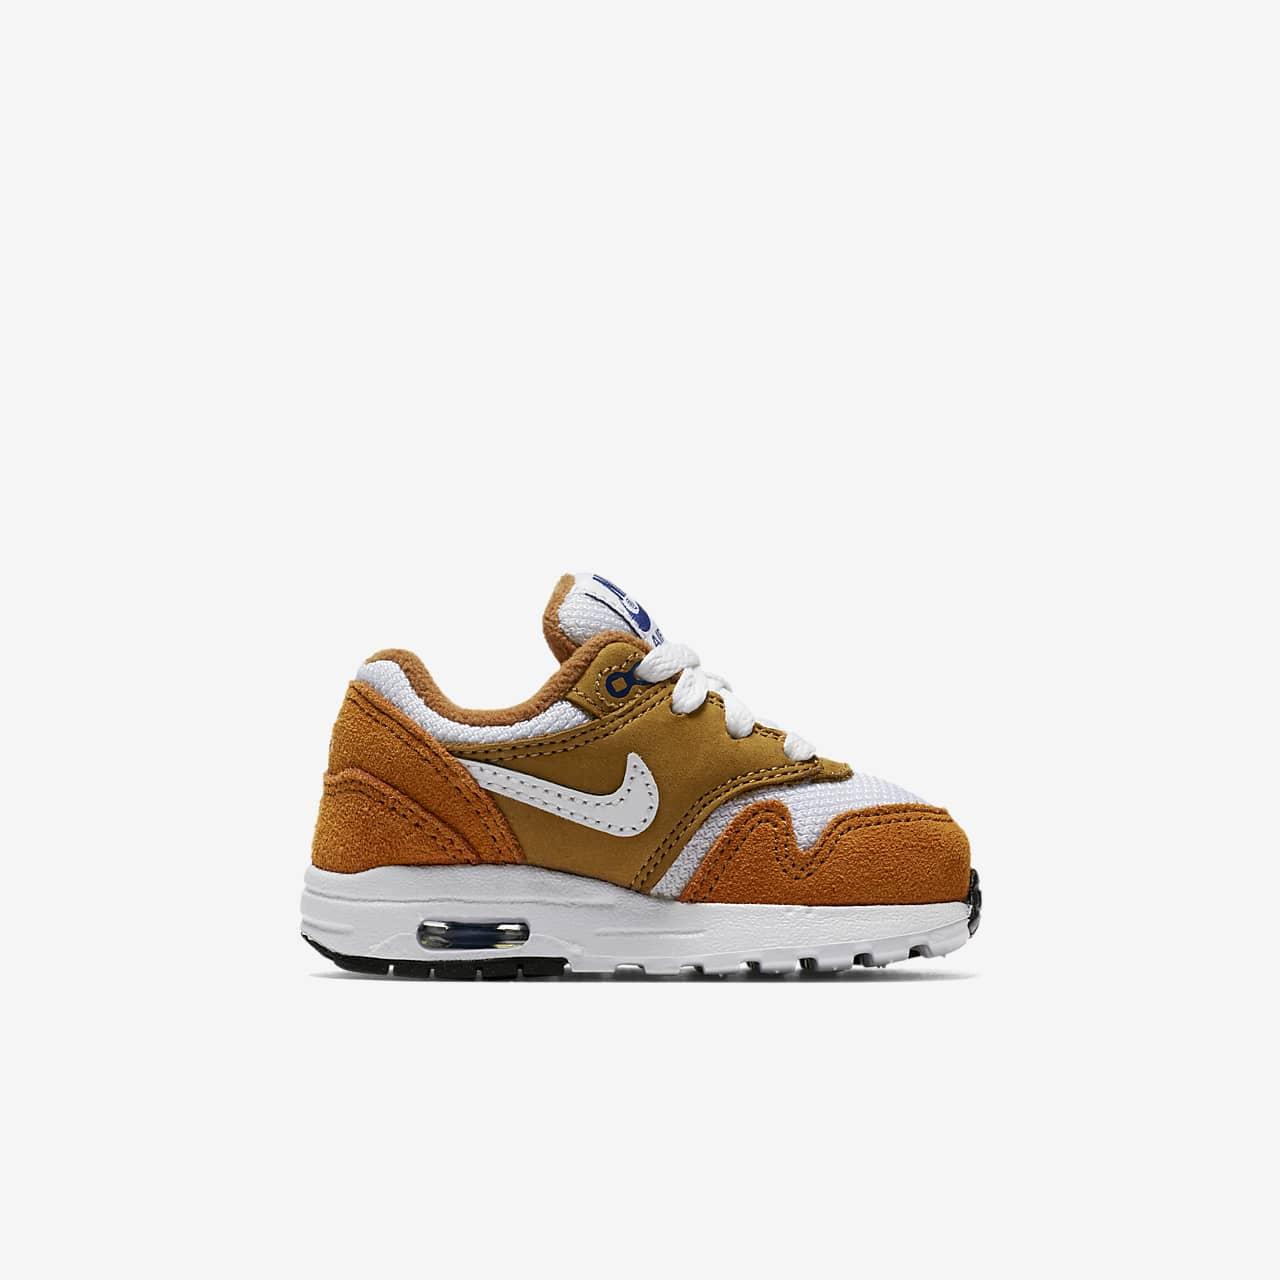 Nike Air Max 1 Premium Retro Baby & Toddler Shoe